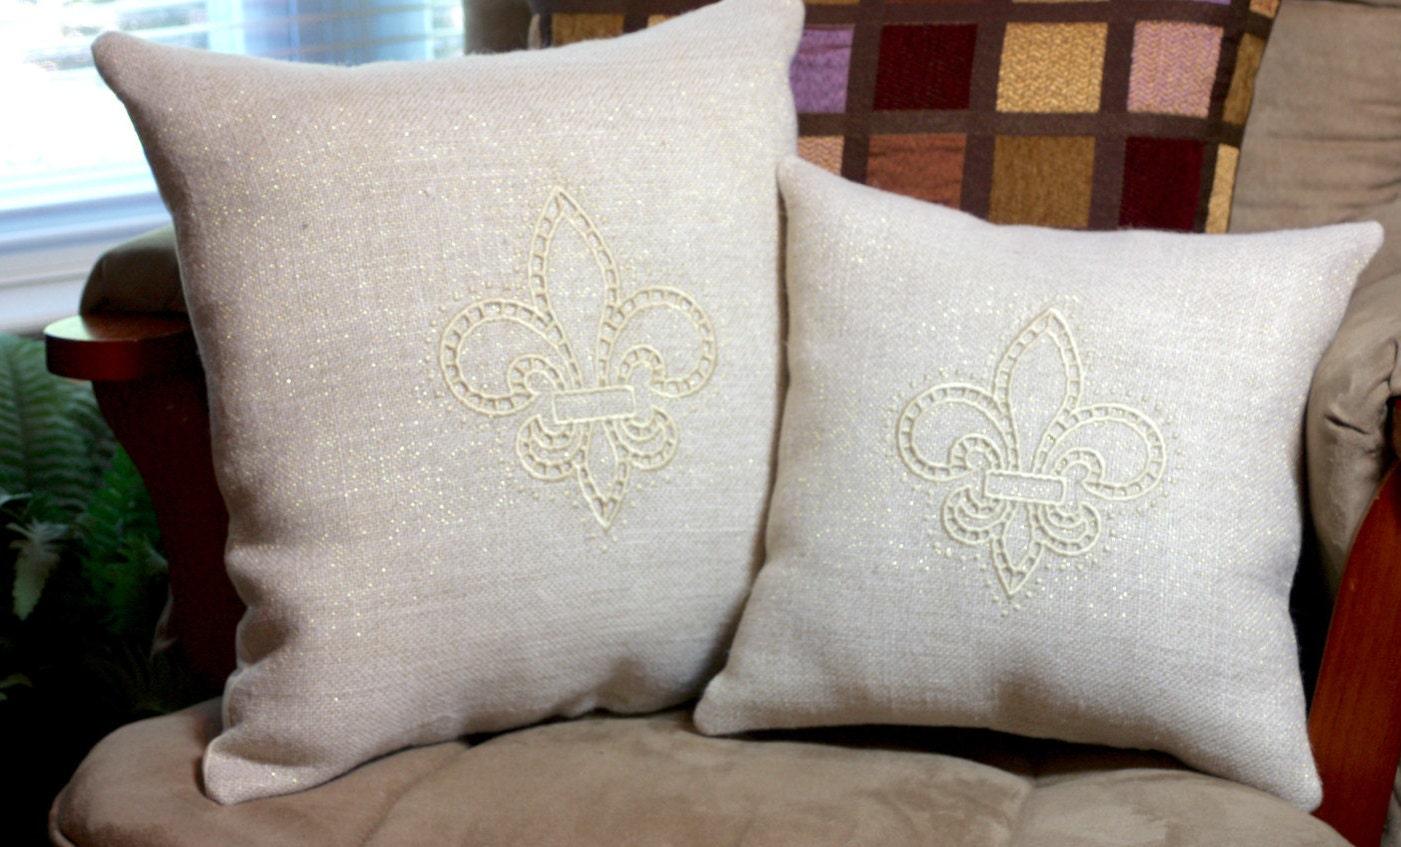 Black and Gold Home Decor Louisiana Decor Burlap Pillow